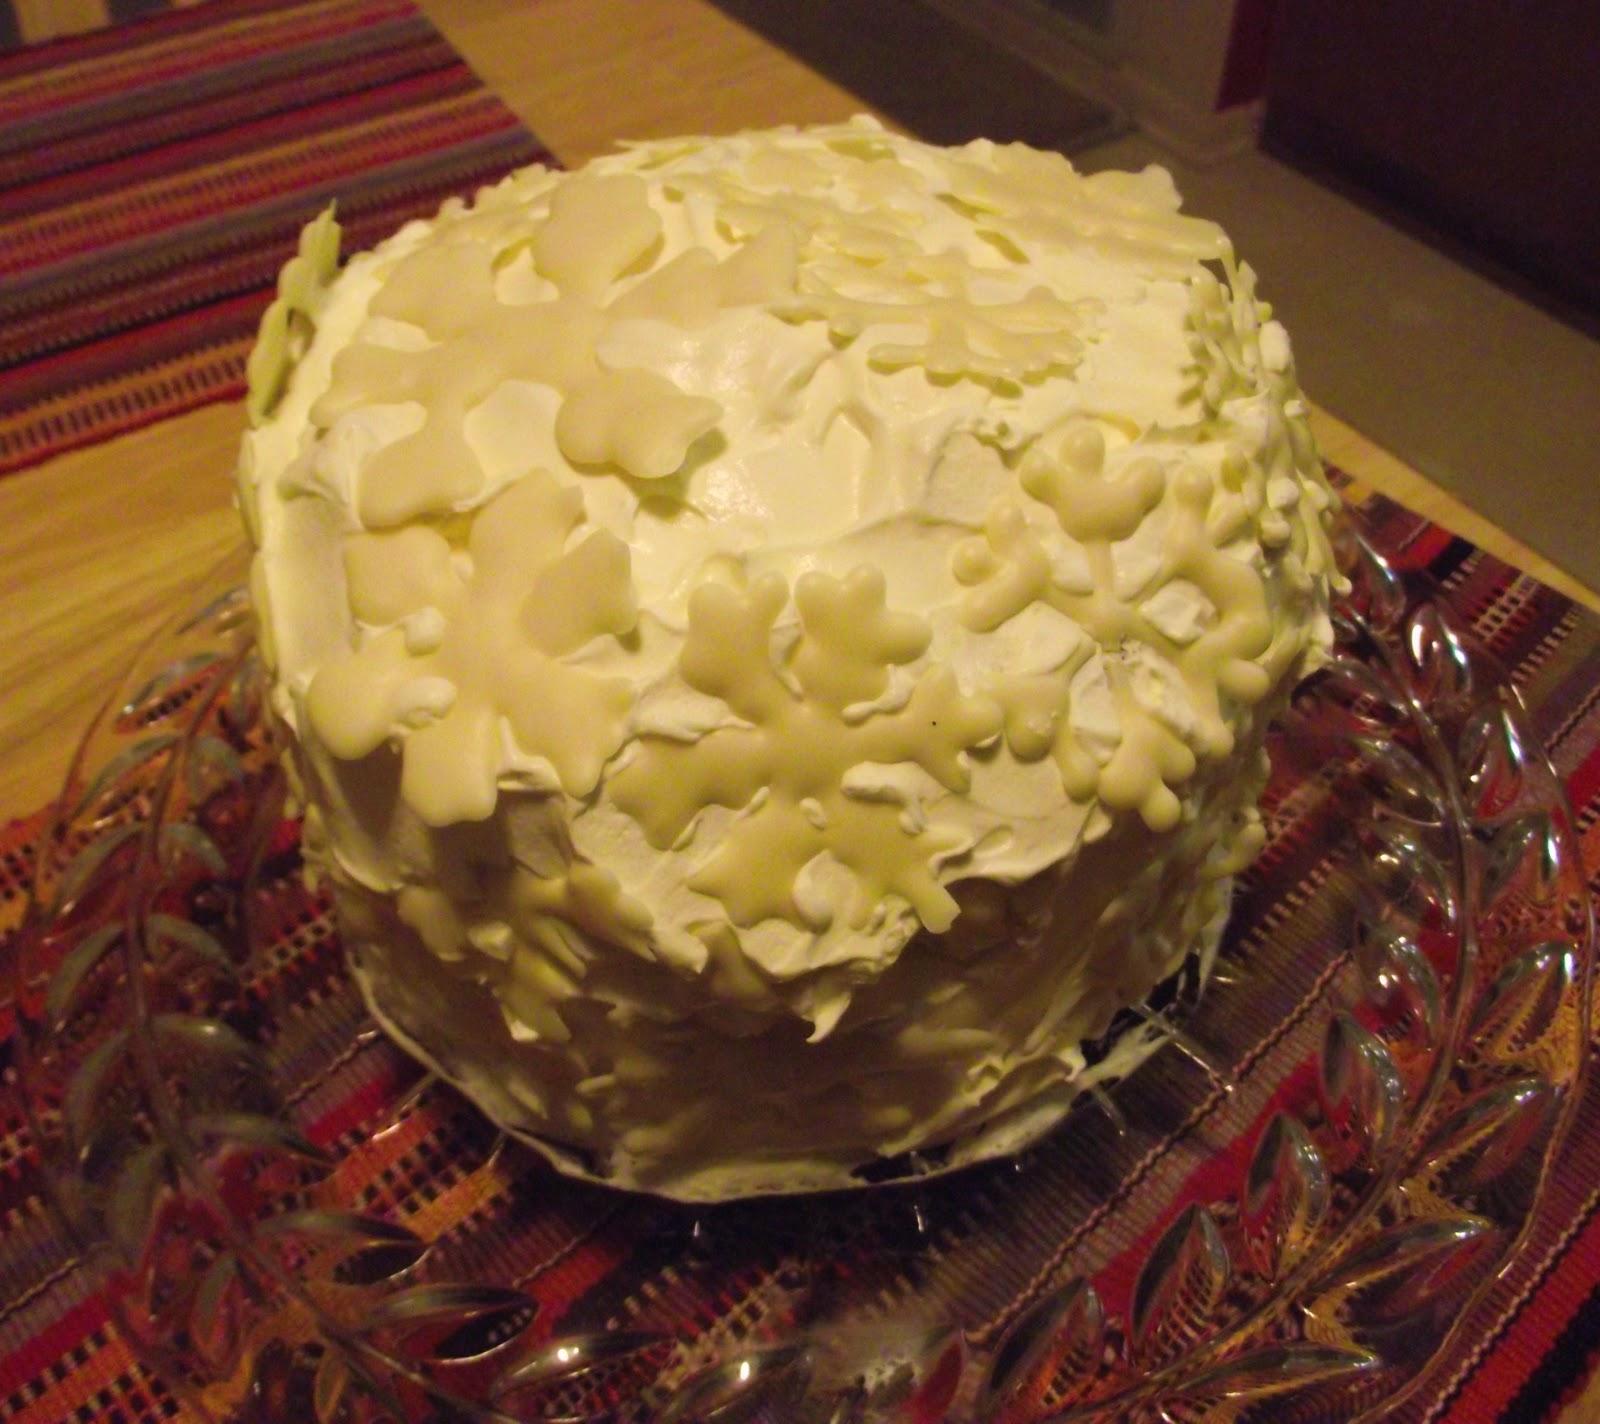 The Family Foodie Happy Birthday To Me Snowflake Cake